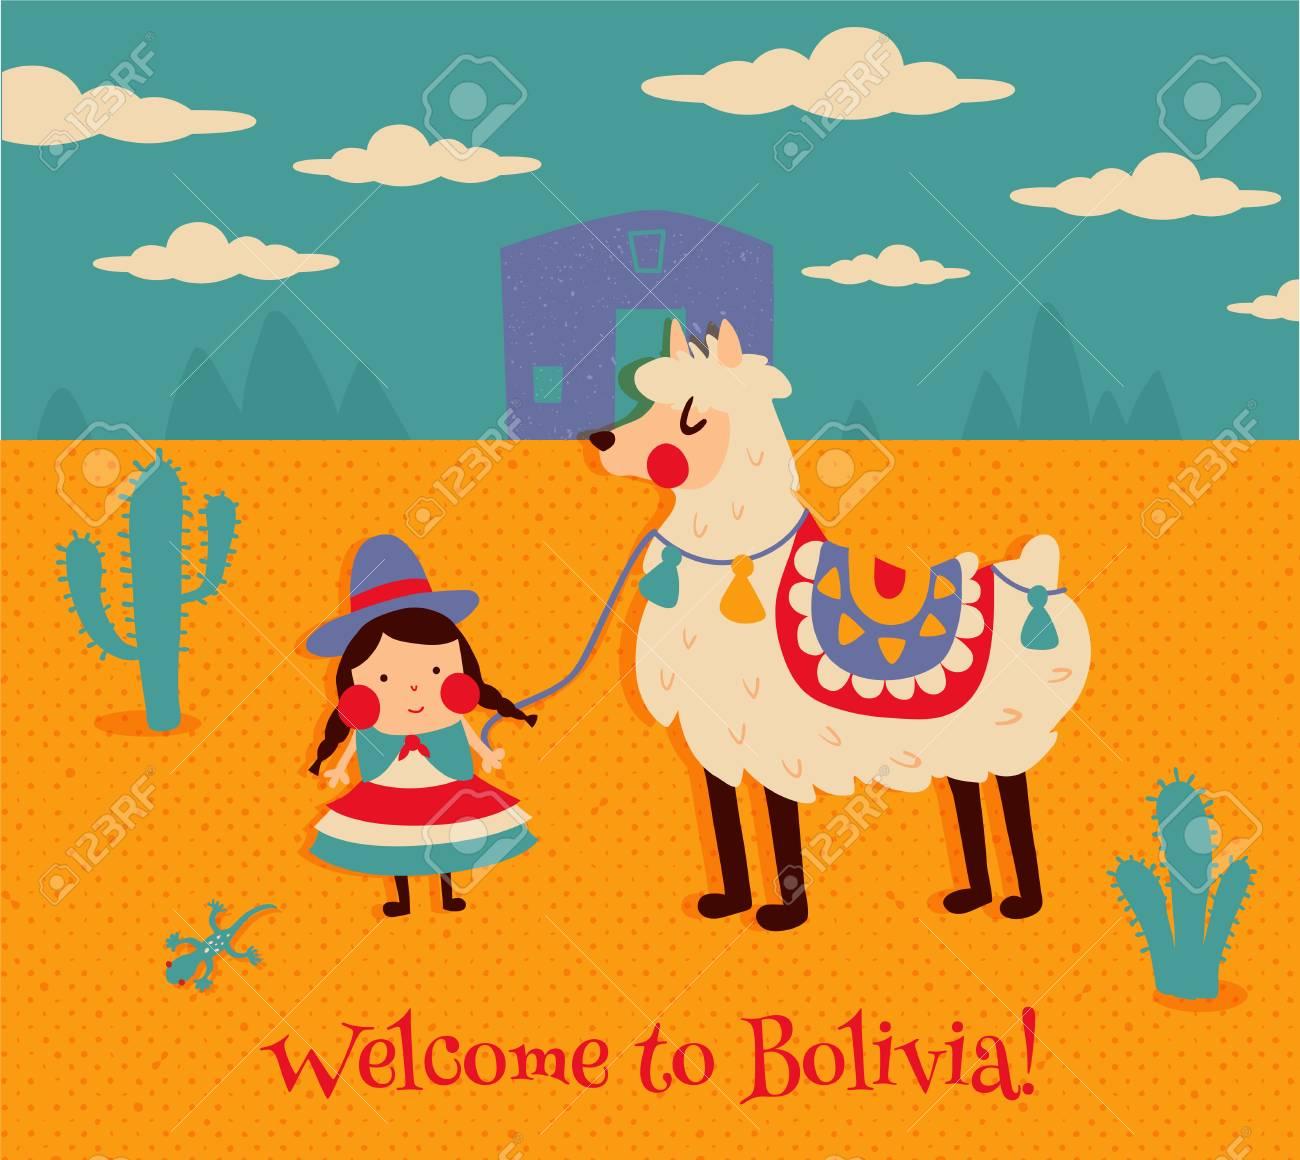 vector illustration, cute bolivian girl in traditional cholita